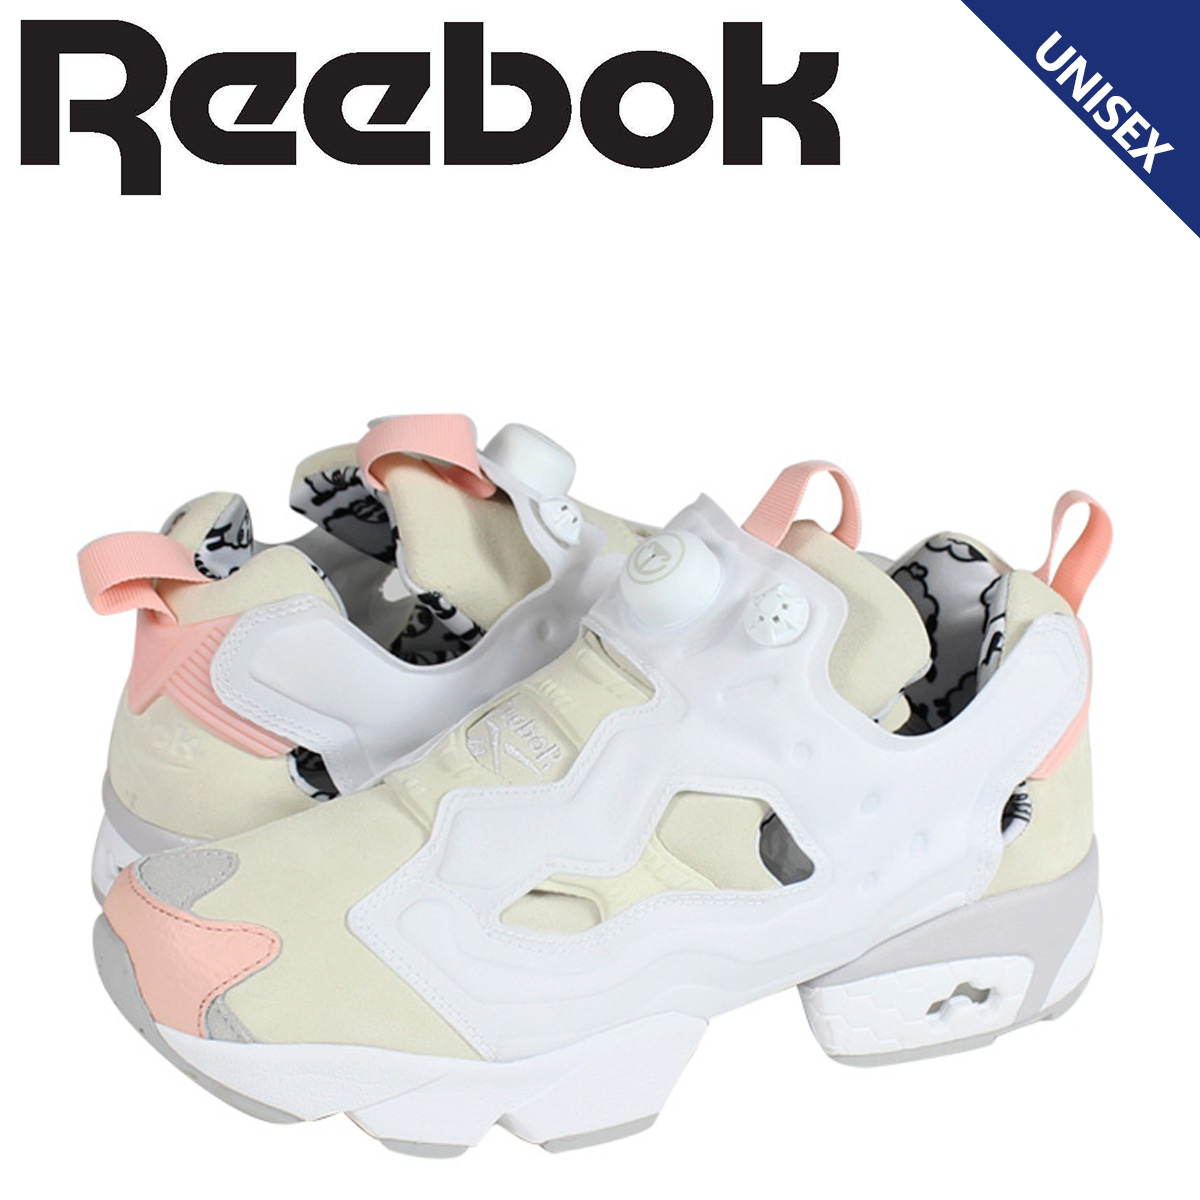 reebok pump fury for sale